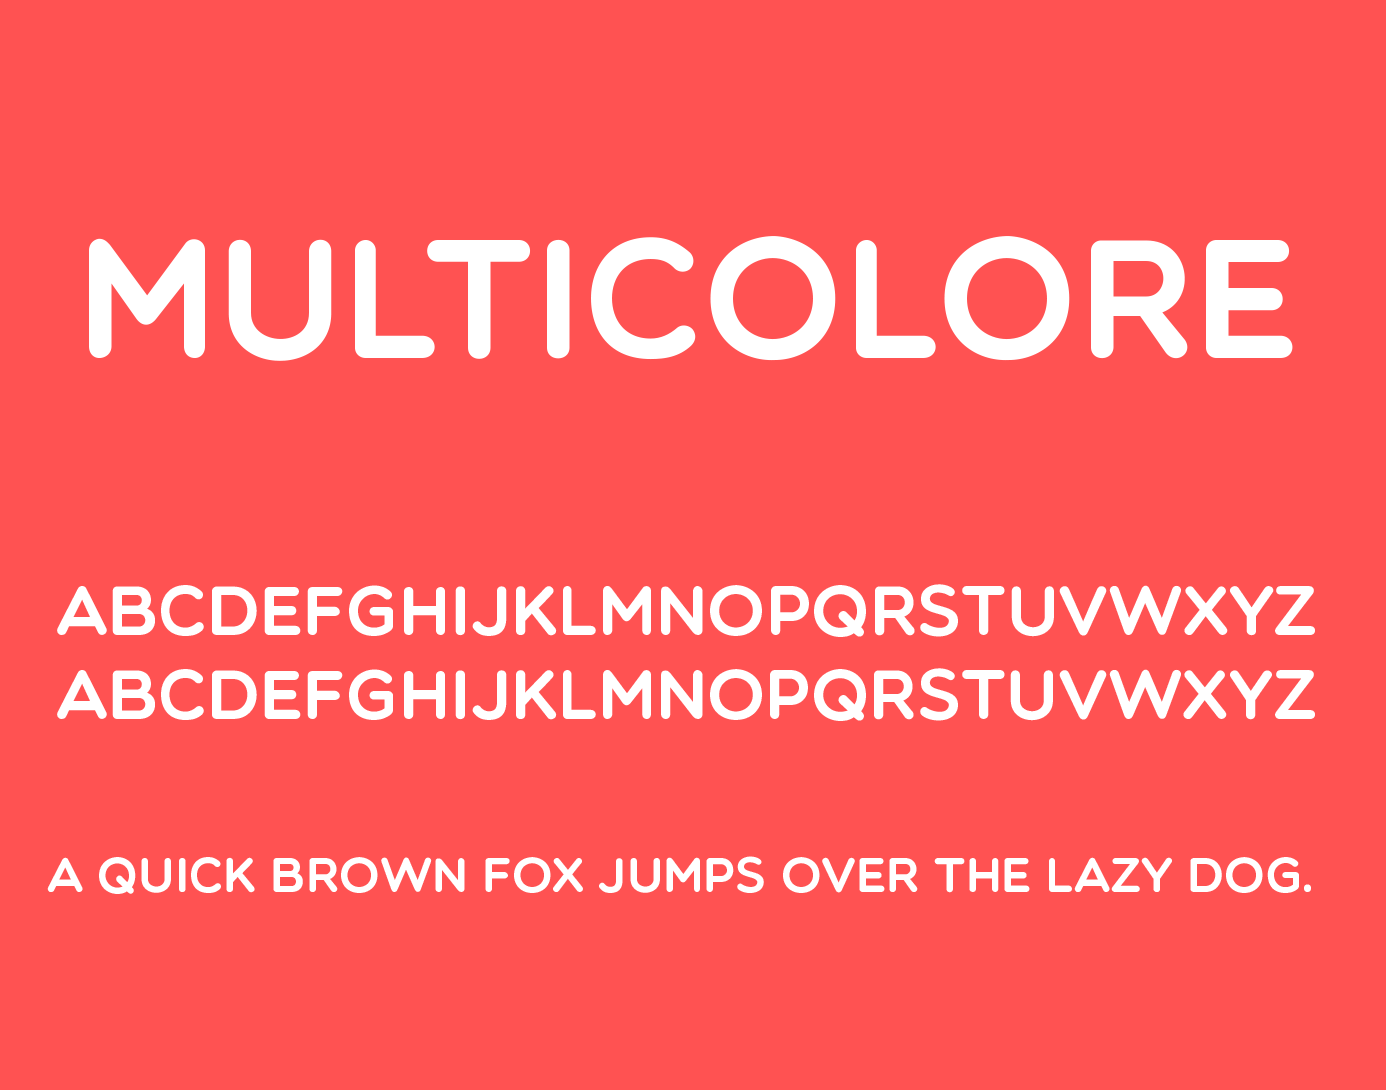 https://fontclarity.com/wp-content/uploads/2019/09/multicolore-font-download-0.png Free Download